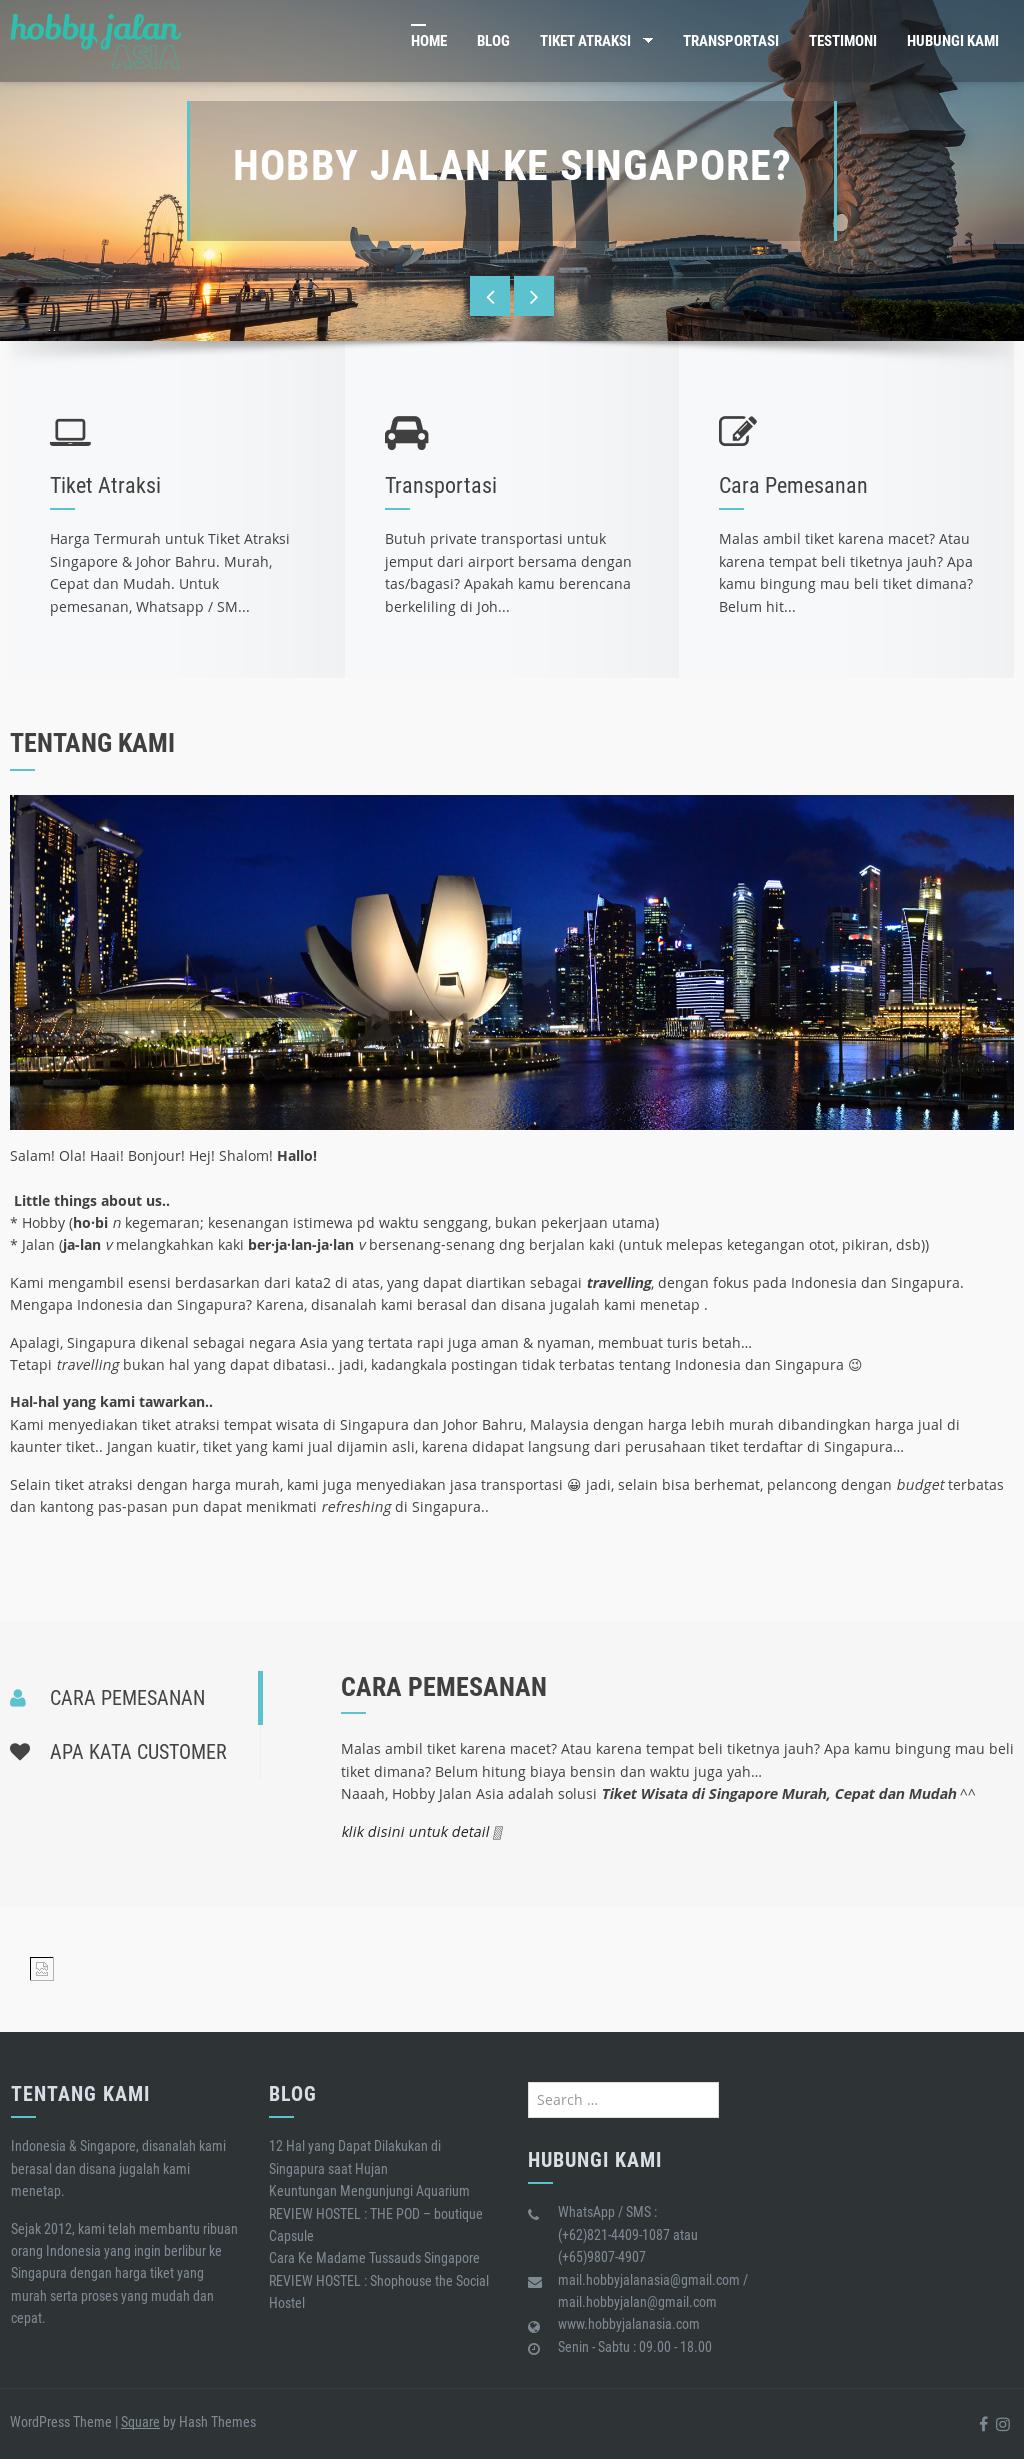 Daftar Harga Tiket Madame Tussauds Singapore Terbaru 2018 Snow City Hobby Jalan Asia Competitors Revenue And Employees Owler Company Asias Website Screenshot